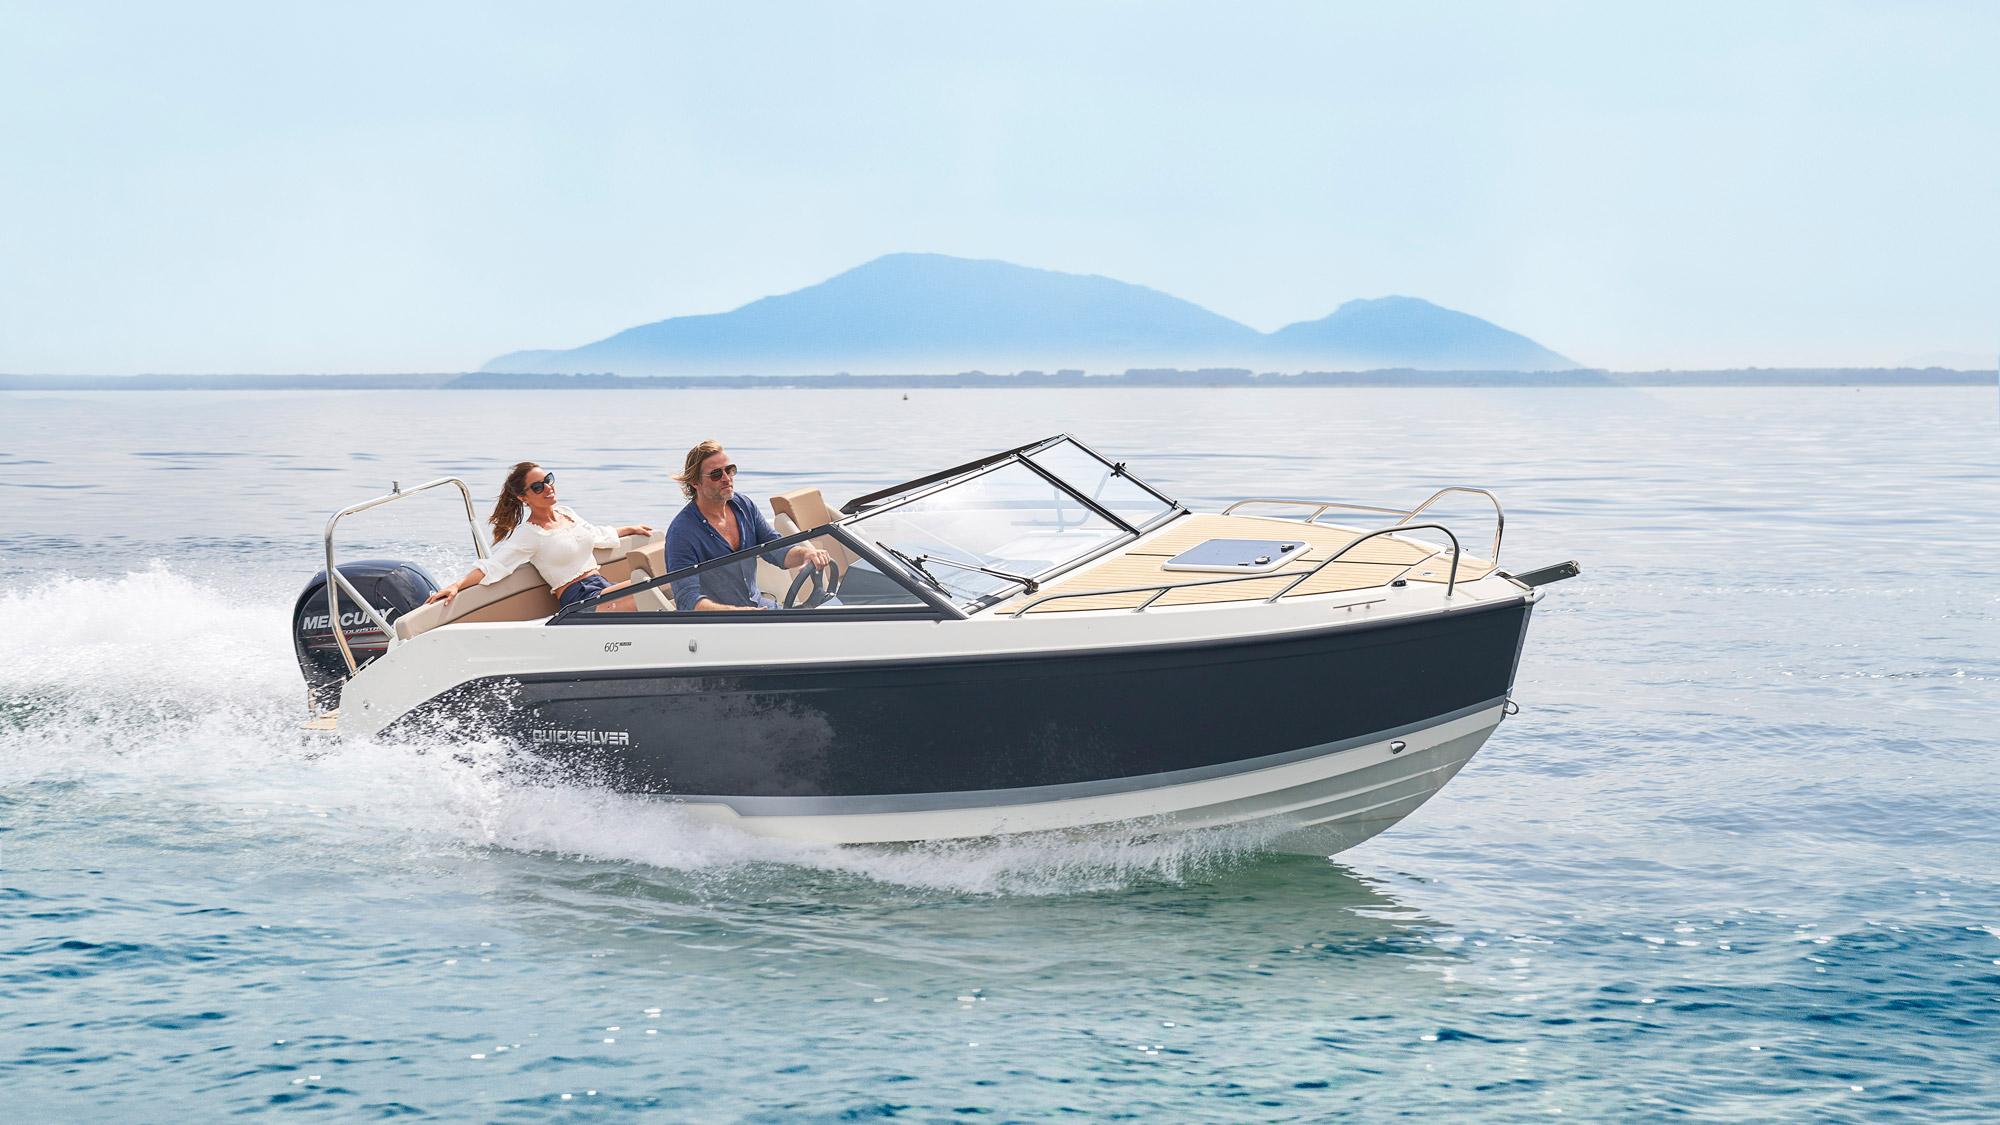 https://www.quicksilver-boats.com/media/391509/20190828-biscarosse-dsc02792_605cr_v2_2000x1125.jpg